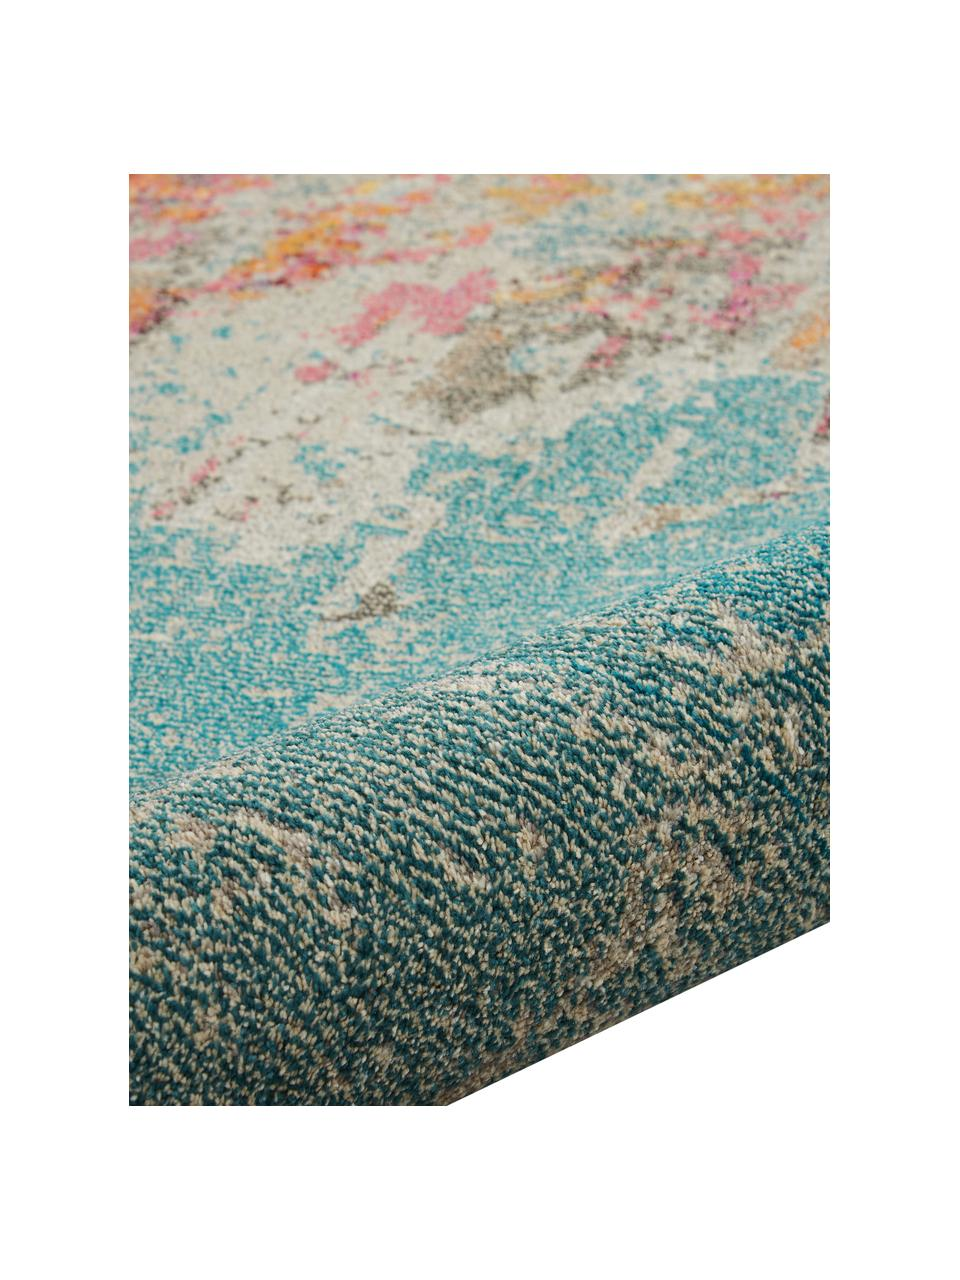 Design vloerkleed Celestial in kleur, Bovenzijde: 100% polypropyleen, Onderzijde: jute, Multicolour, B 240 x L 320 cm (Größe L)